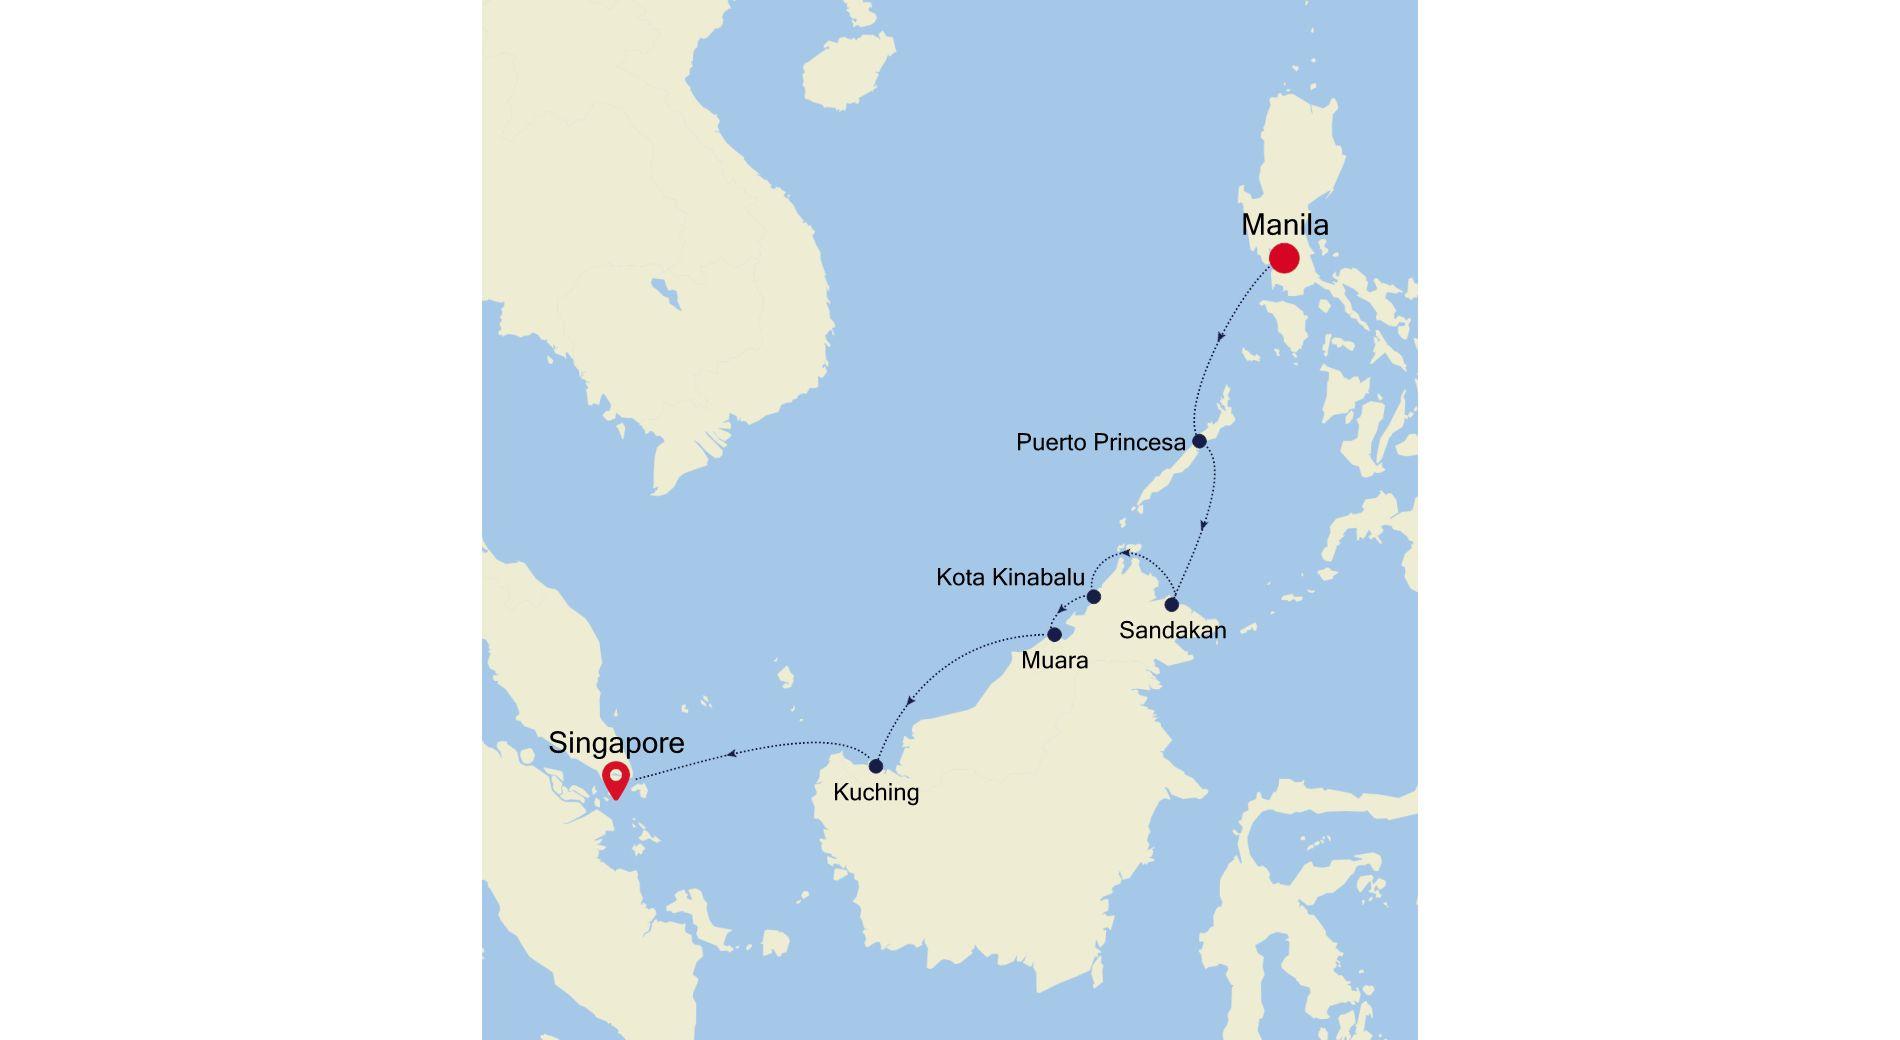 5936A - Manila to Singapore